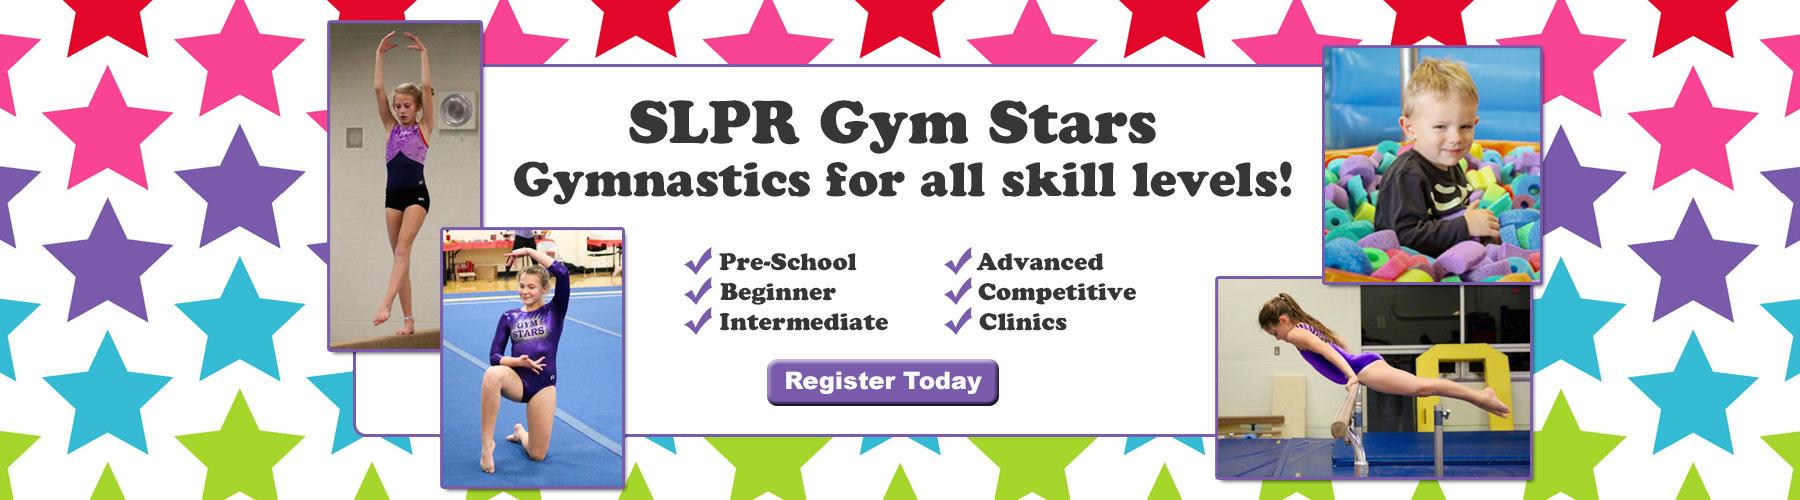 Gym Stars Gymnastics at SLPR